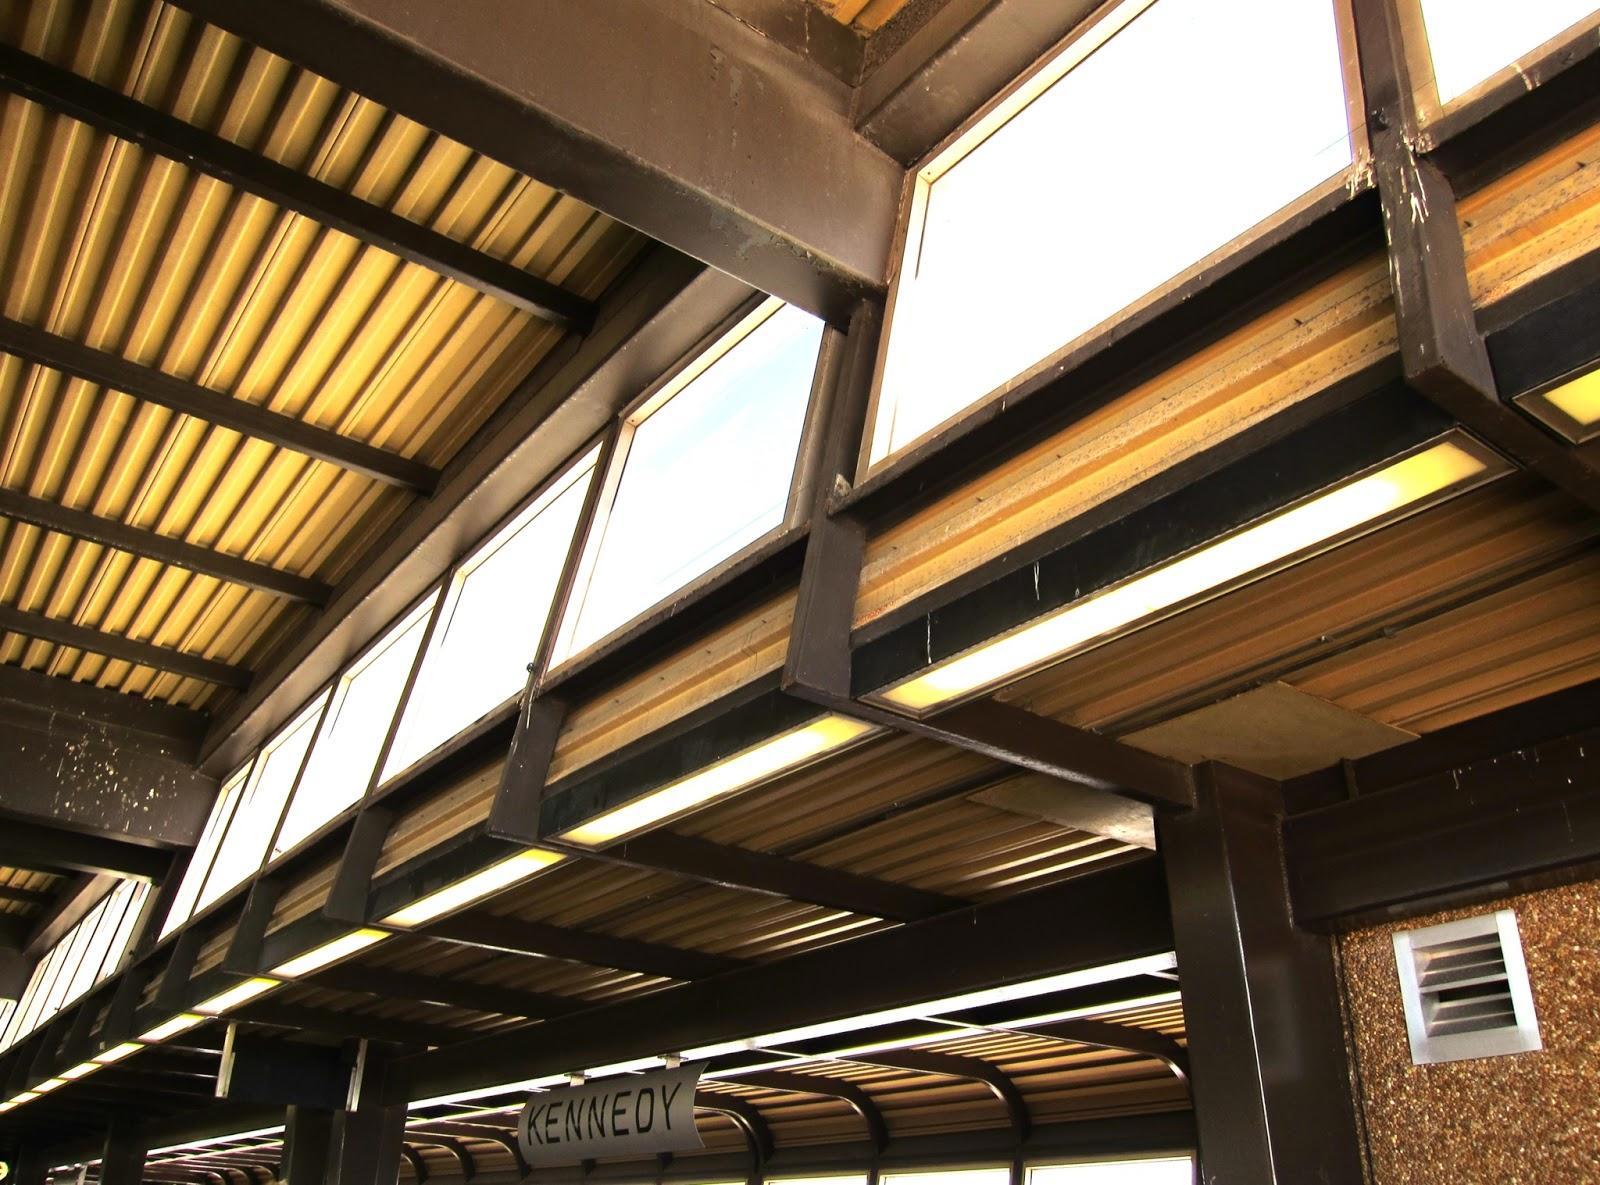 Kennedy station RT platform interior ceiling view